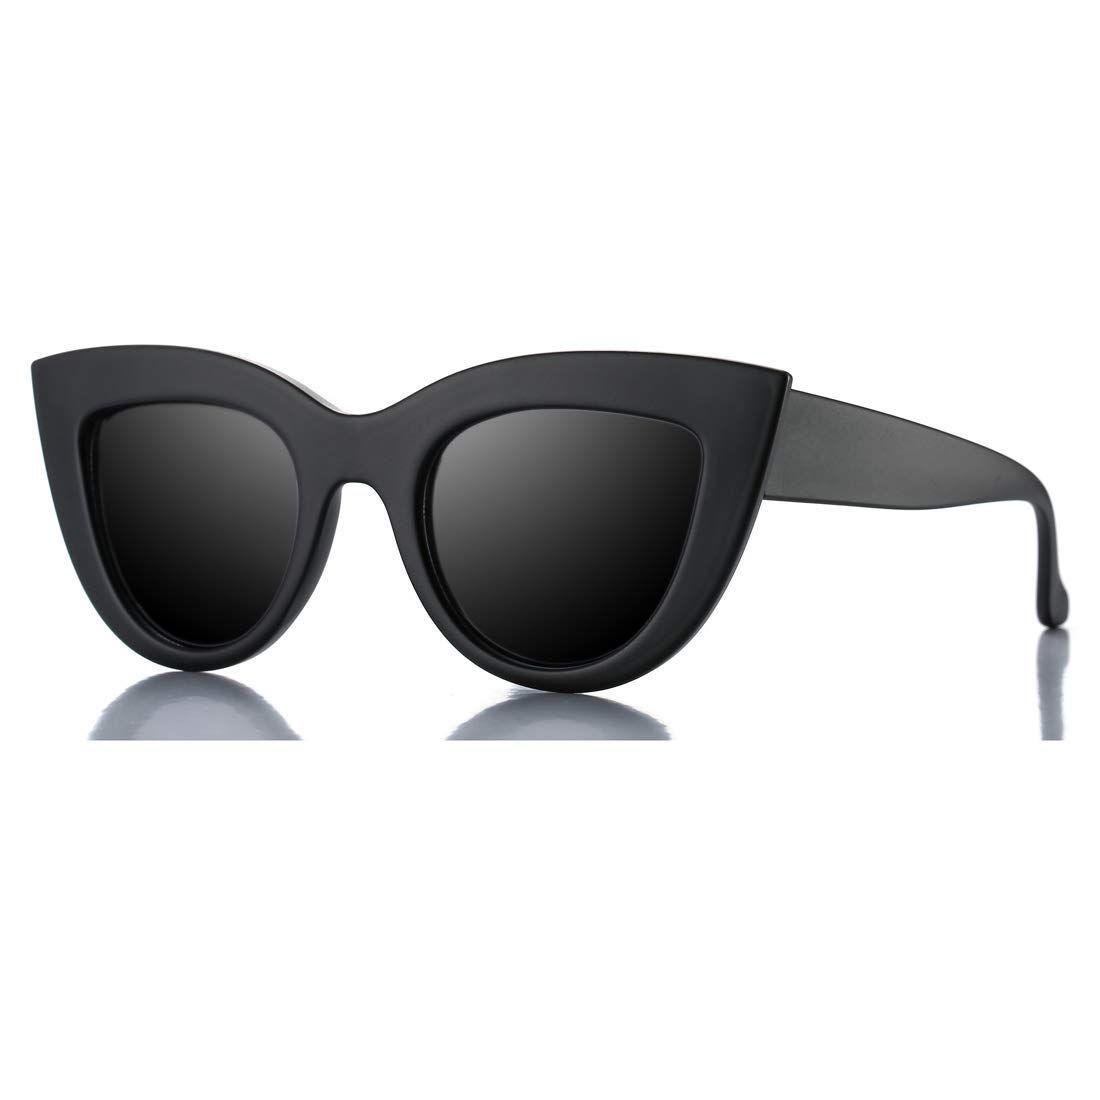 c37ced621fe Amazon.com  Retro Cateye Sunglasses for Women Fashion Mirror UV400  Protection Cat Eye Sun Glasses (Matte Black Frame Black Lens)  Shoes